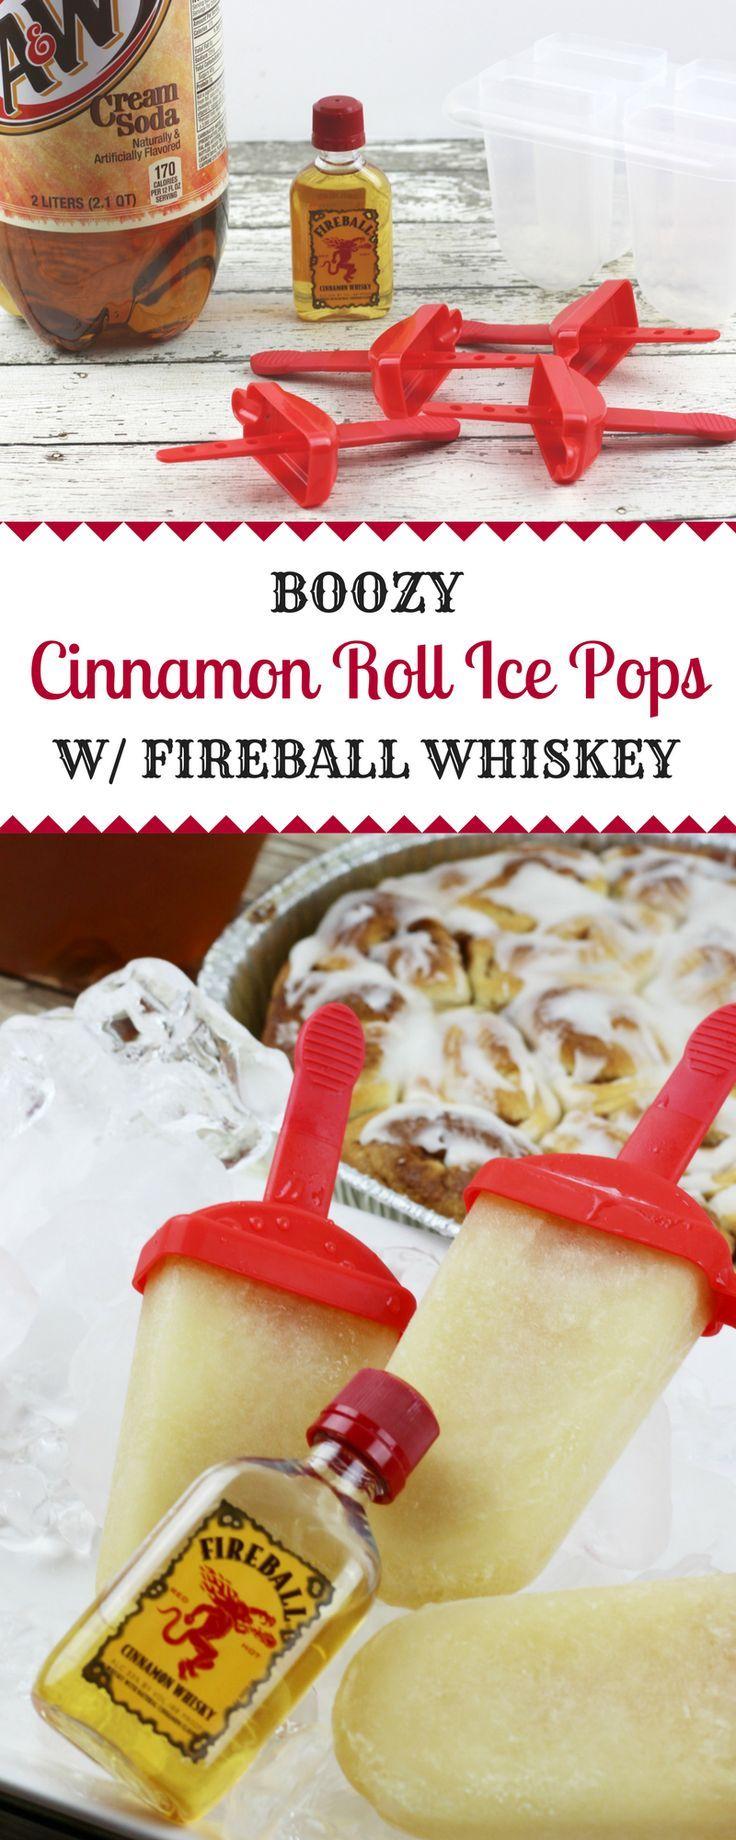 Fireball whiskey cinnamon roll boozy ice pop receta bebida el fireball whiskey cinnamon roll boozy ice pop receta bebida el calor y cubos forumfinder Images